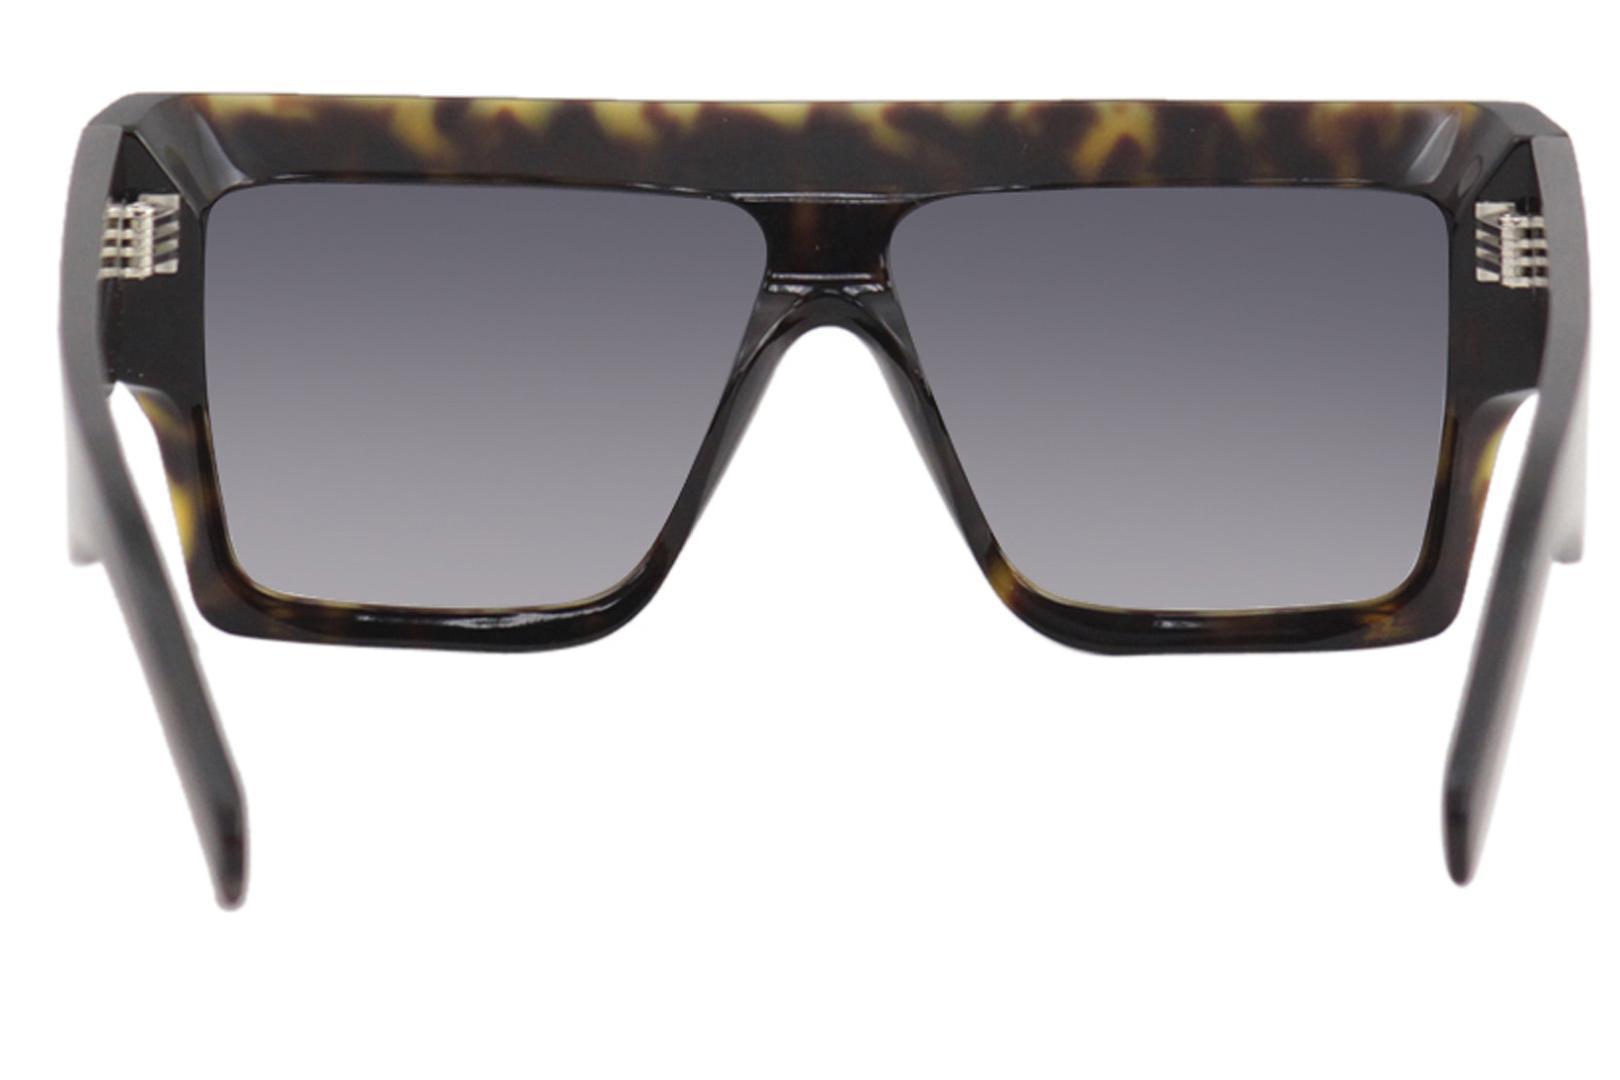 e8b2e920fcb3 Celine Women's CL40030I CL/40030/I Fashion Square Sunglasses